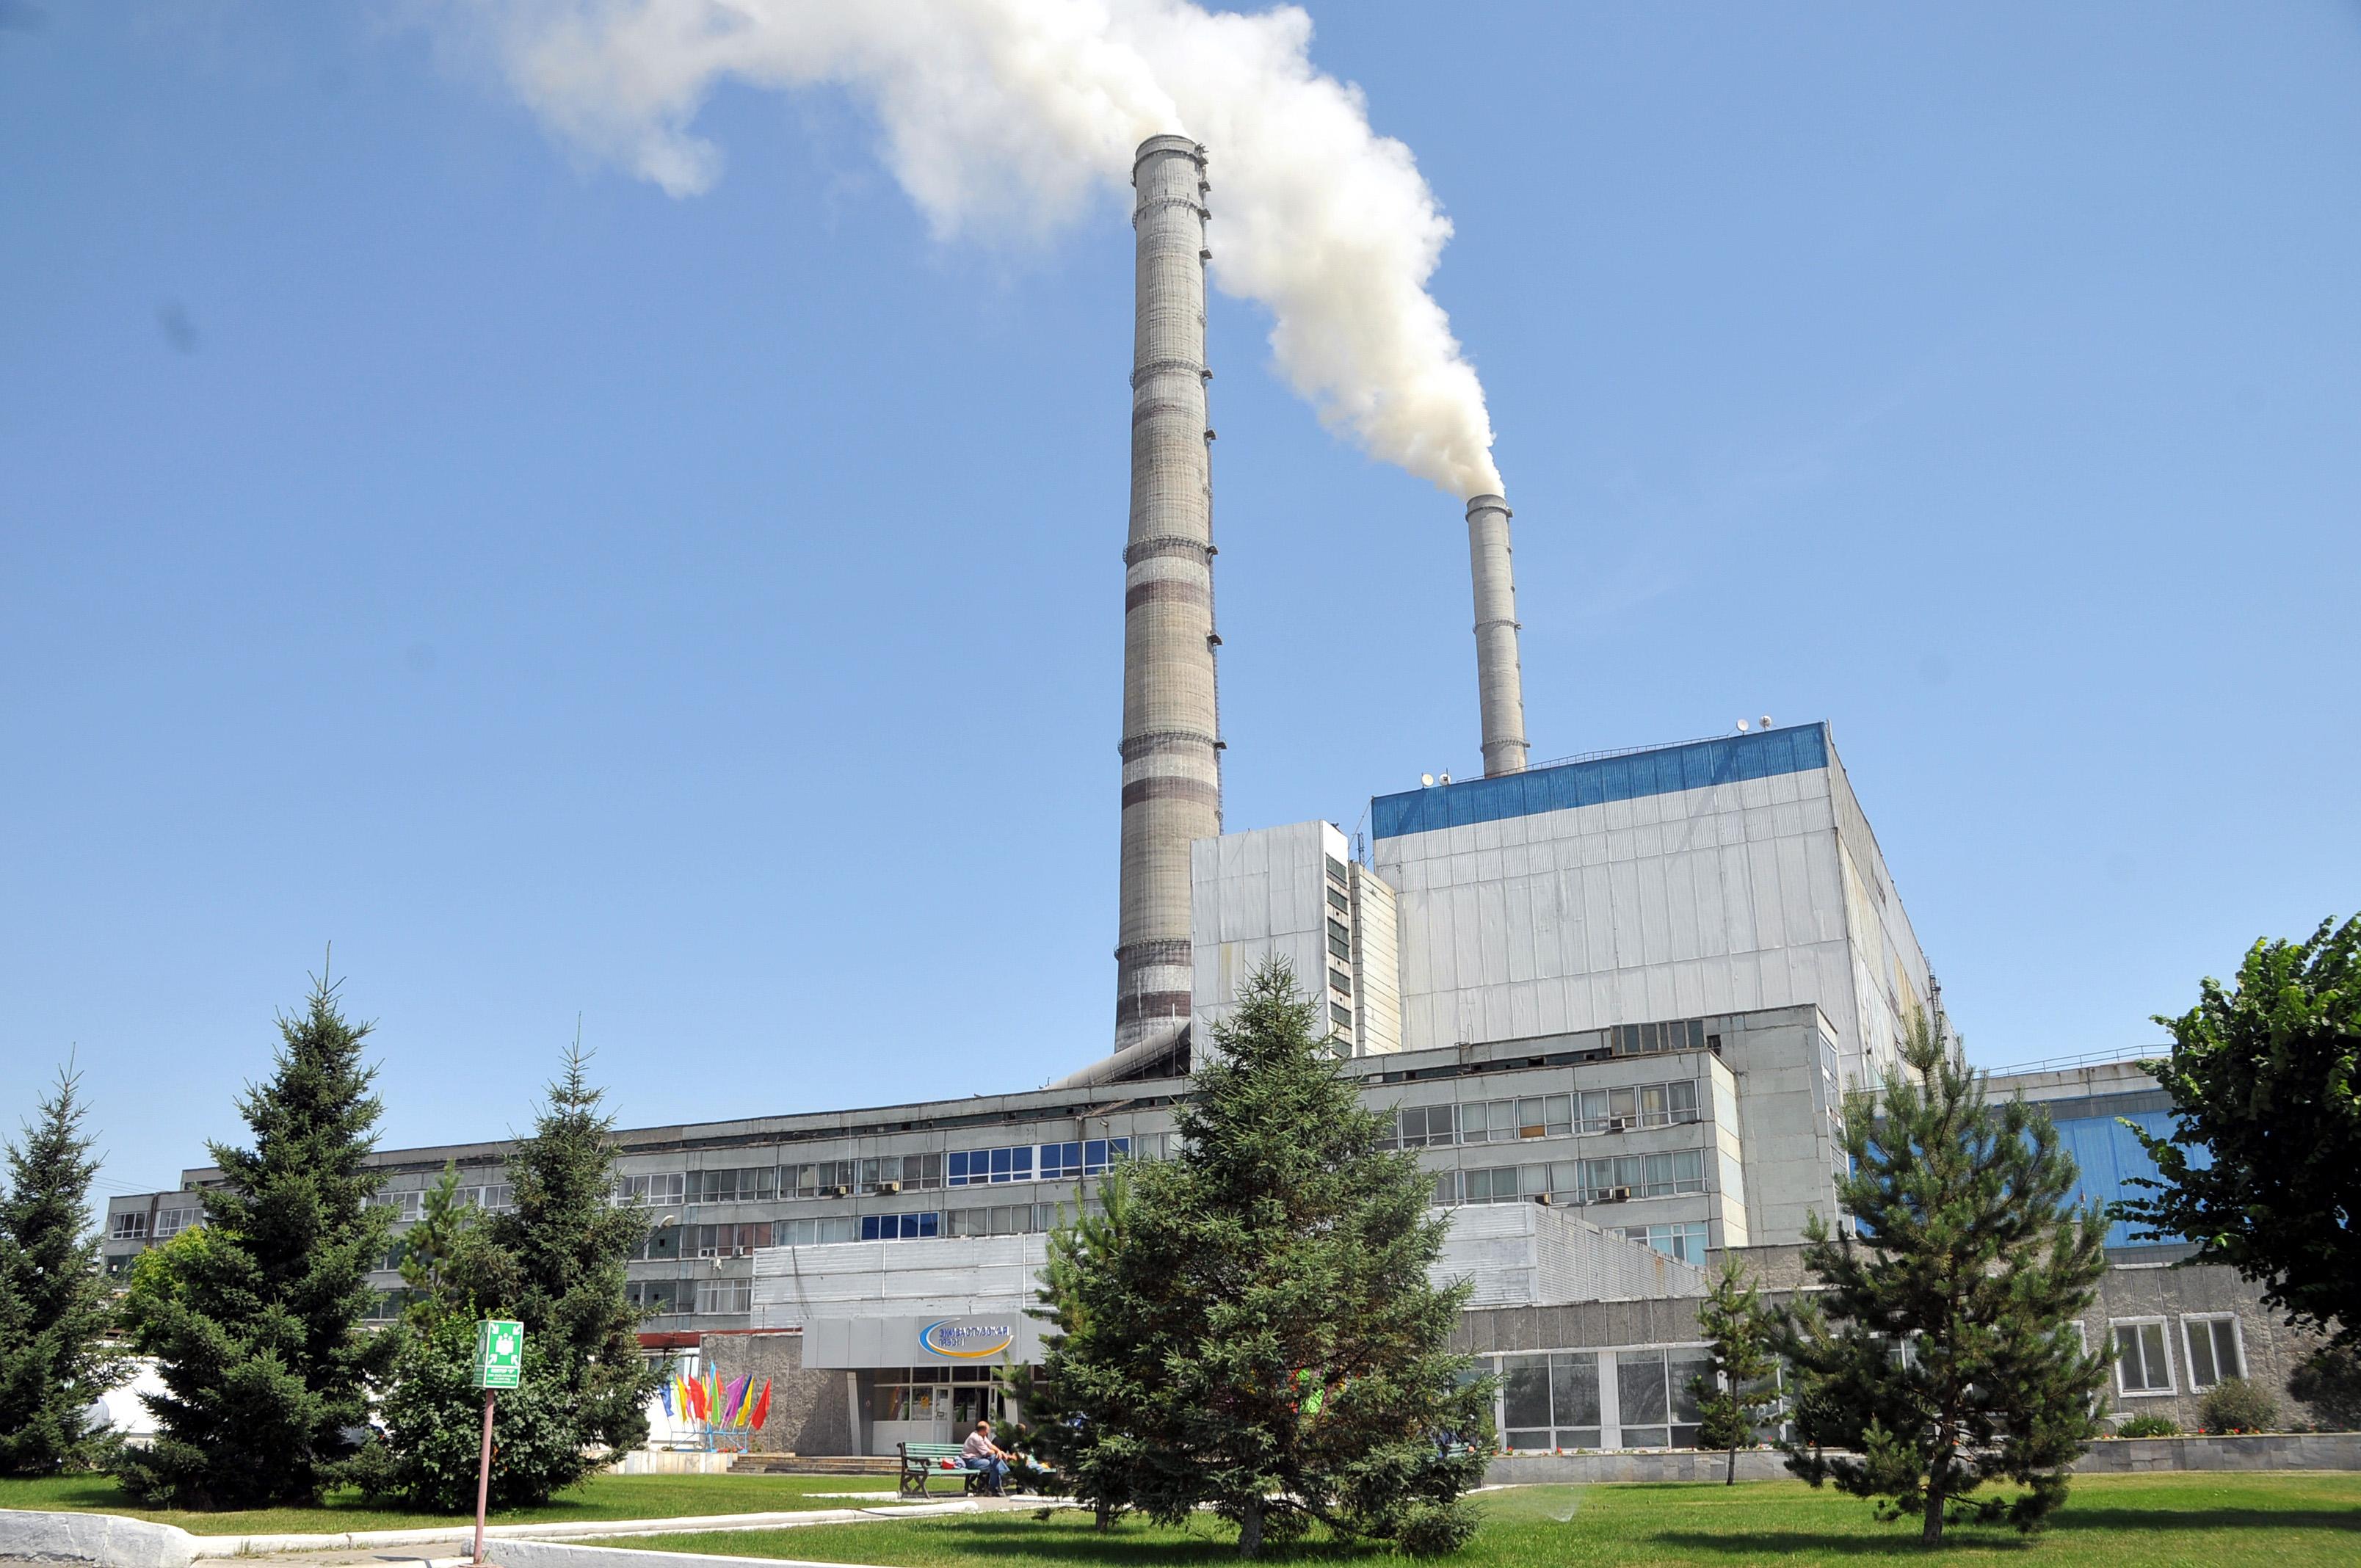 Emerson chosen to modernize controls at Ekibastuz GRES 1 largest